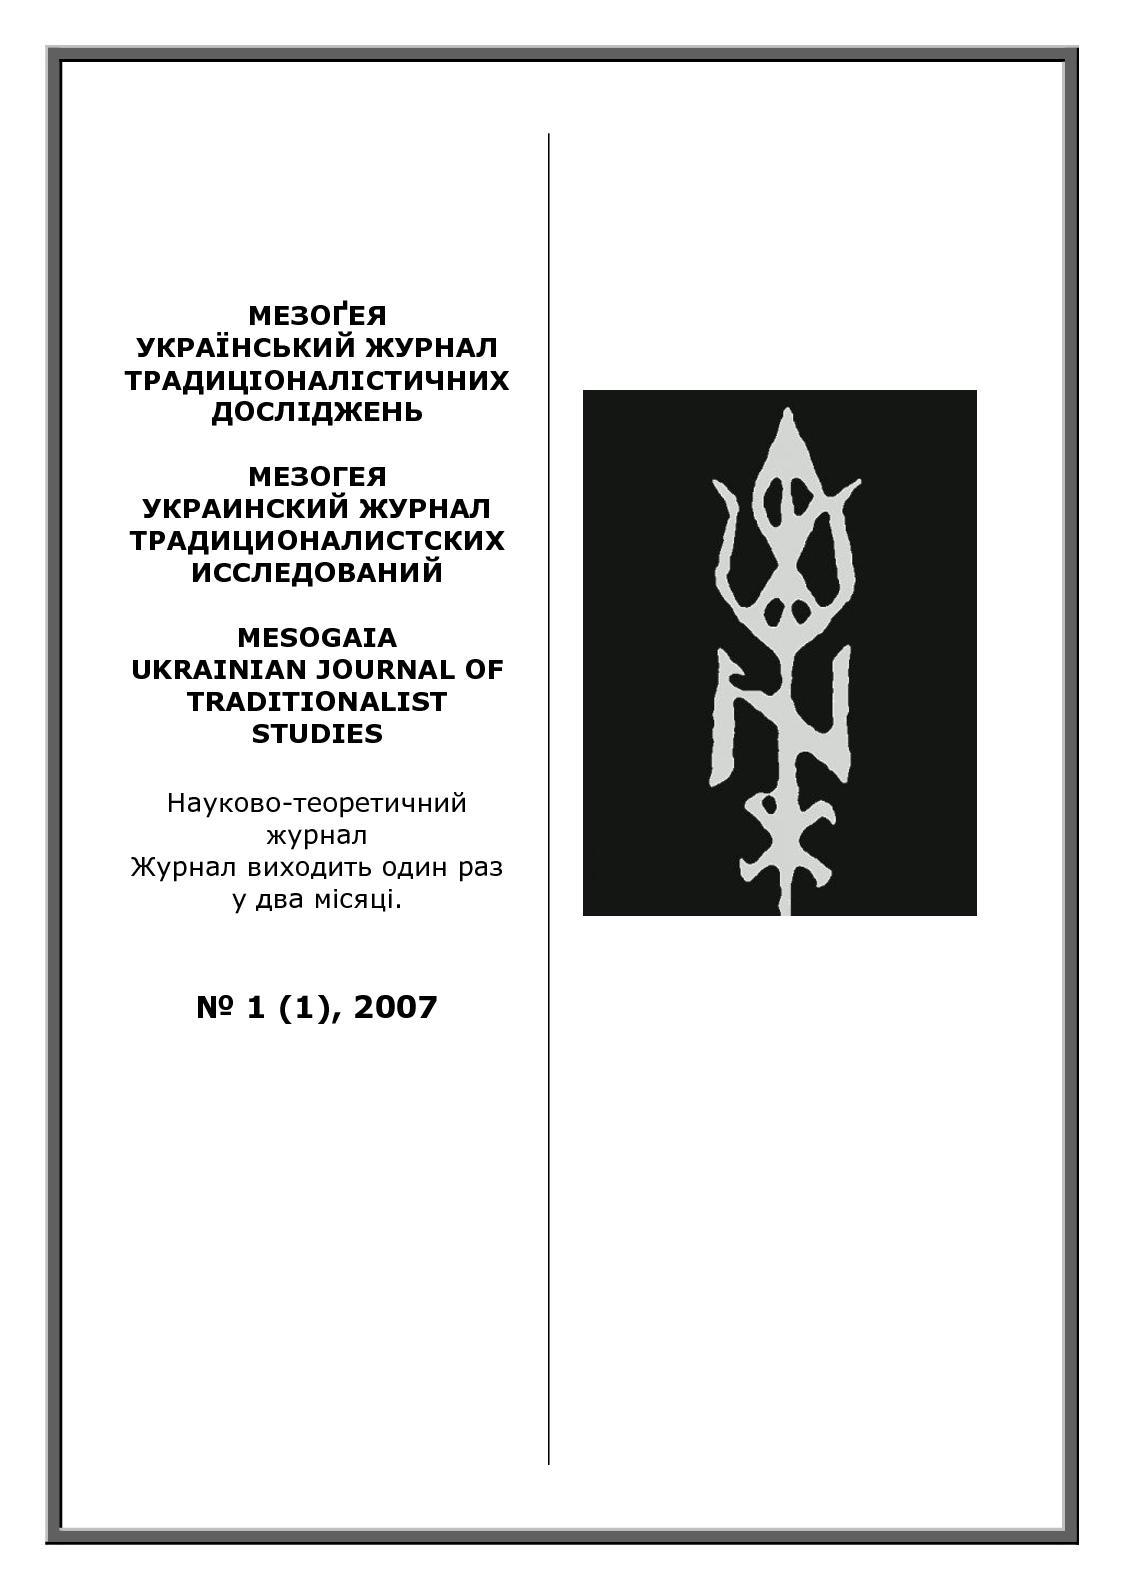 Calaméo - MESOGAIA 44373c24f93a2